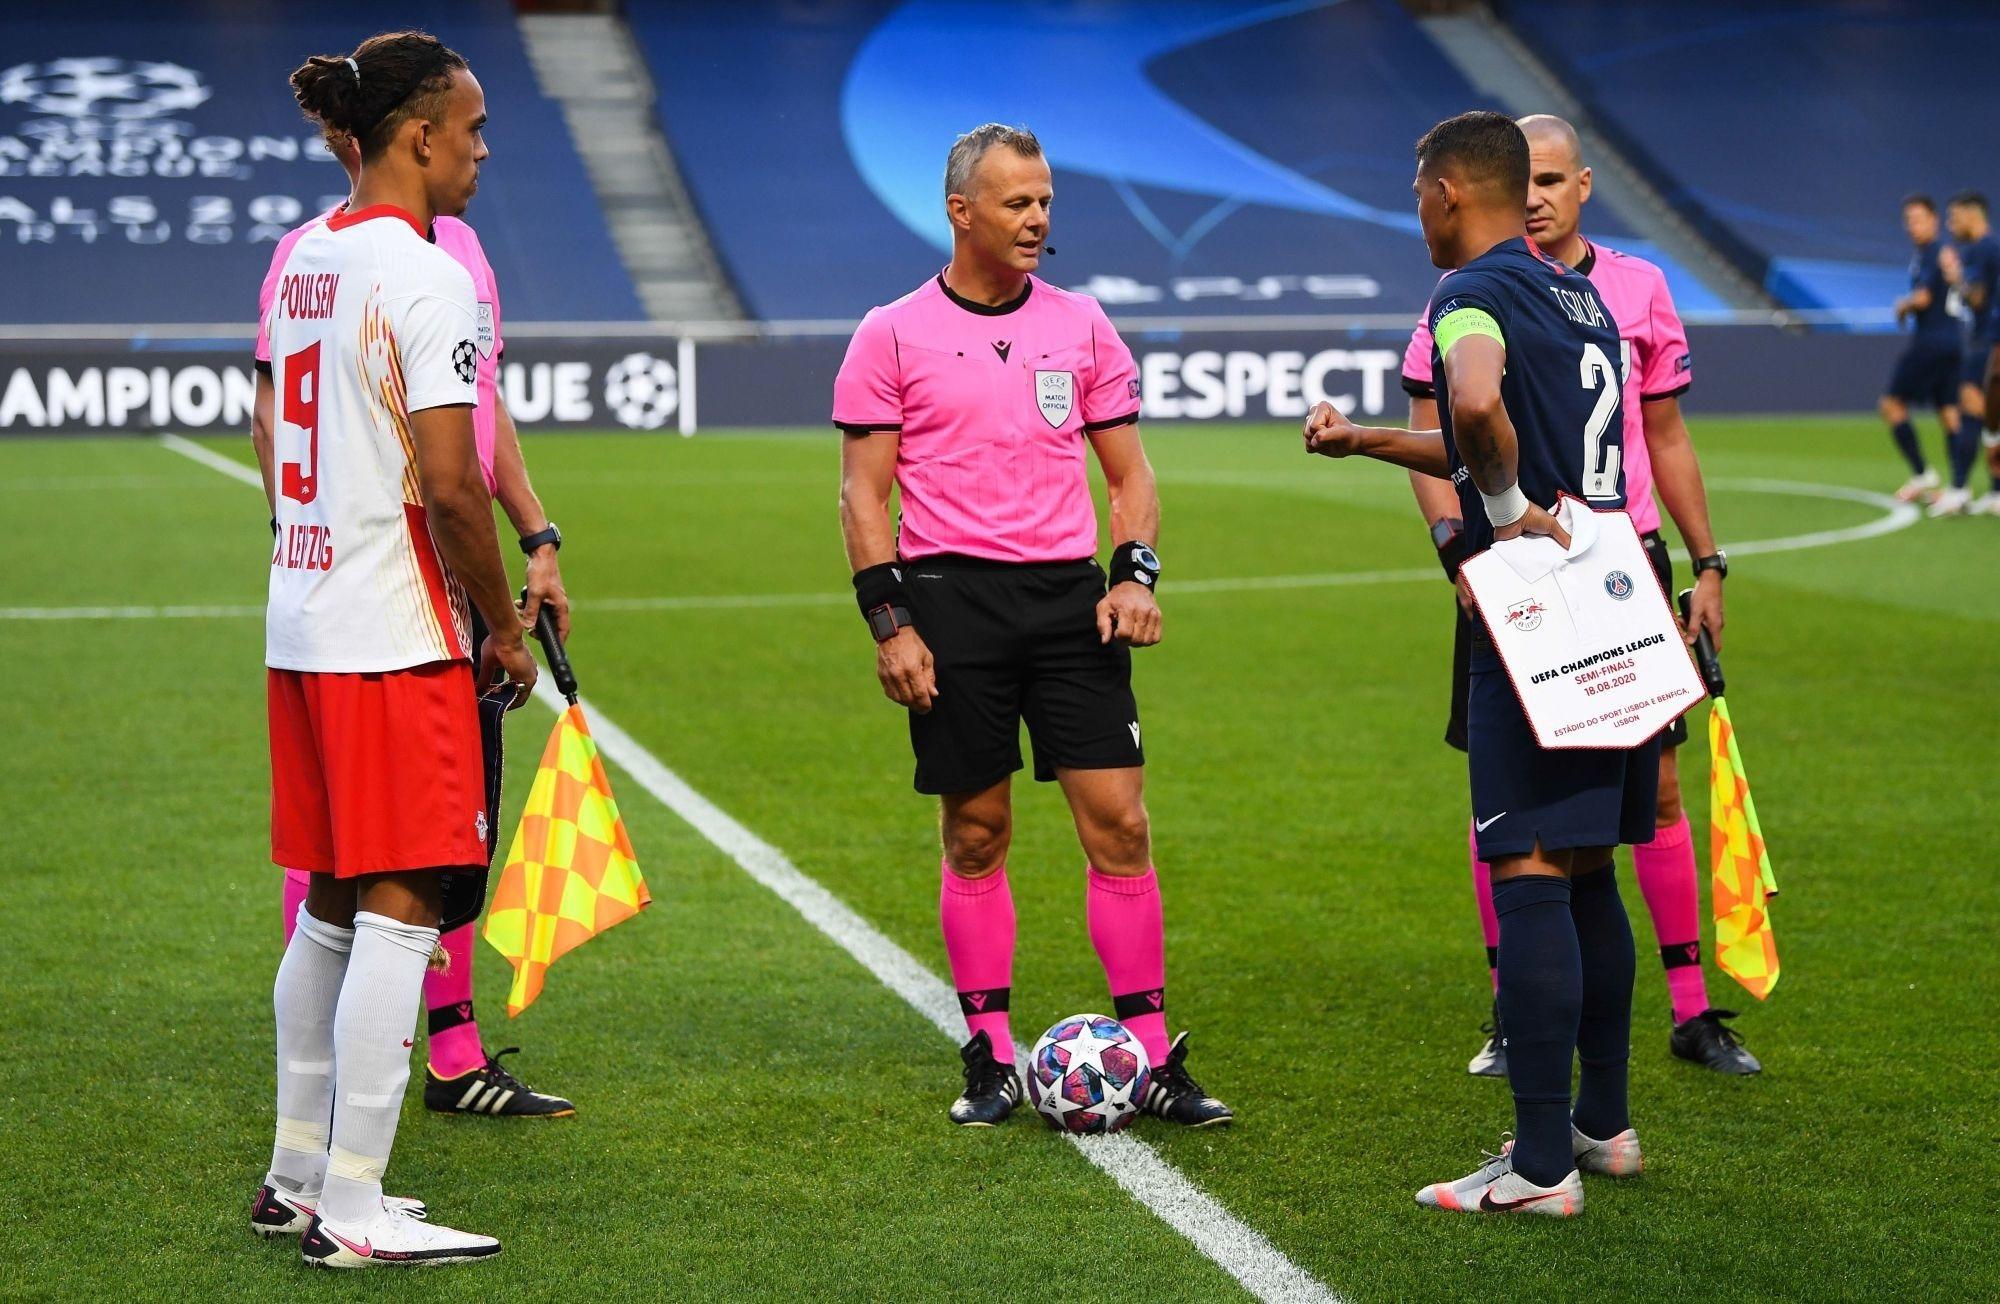 Barça/PSG - Kuipers arbitre de la rencontre, peu de cartons et souvenirs divers